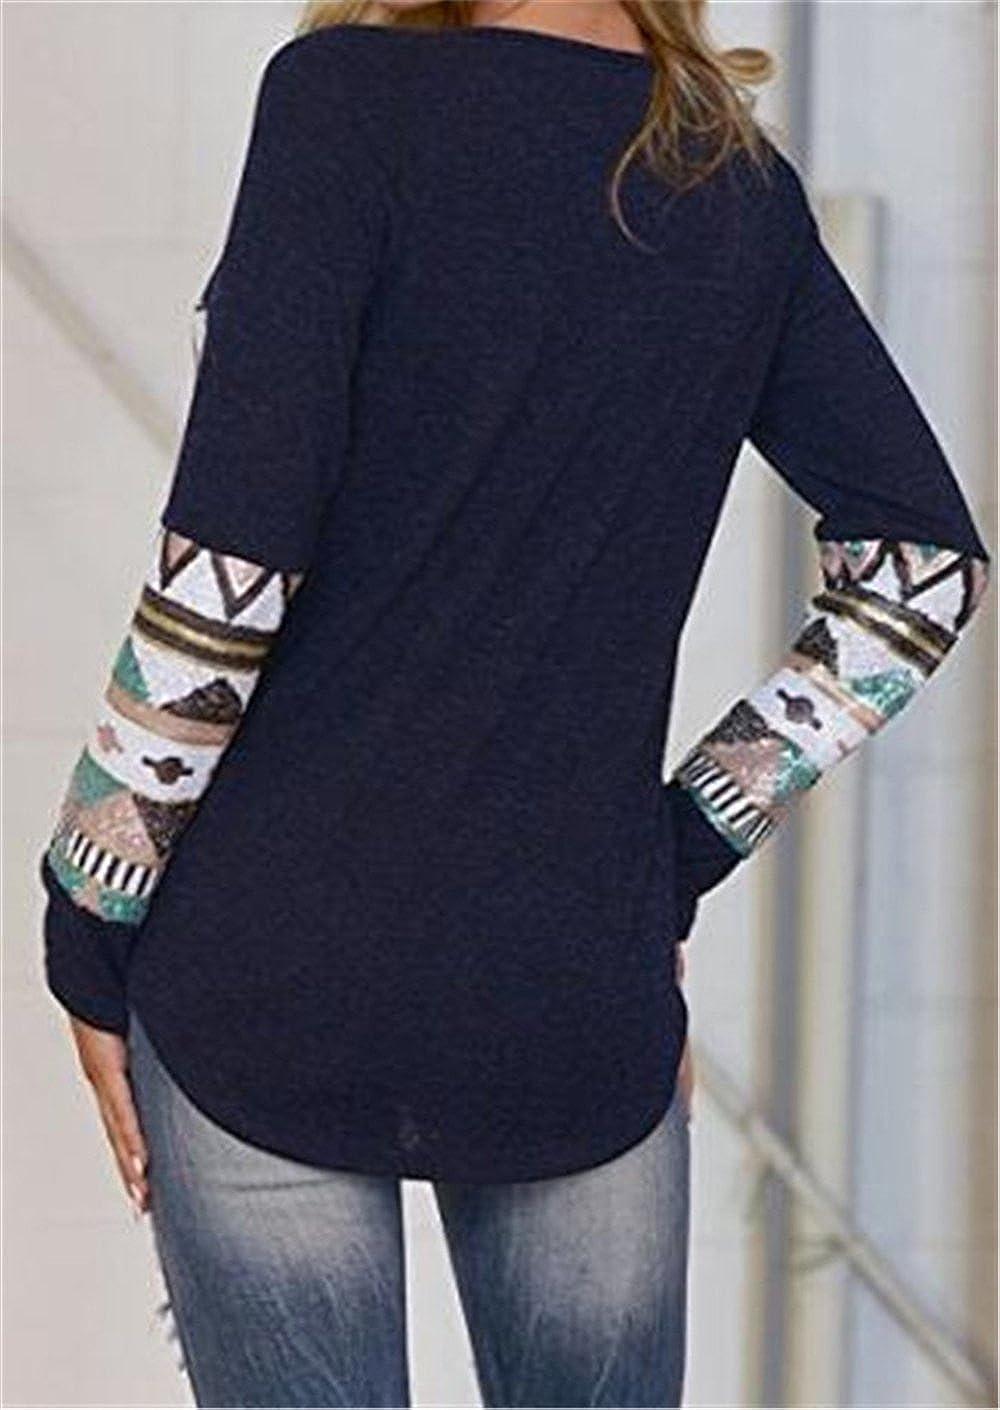 Mujeres Camisetas De Manga De Cuello Redondo Sexi Slim T Shirt Blusas Camisas Sweatshirt Tops Clasicos Universidad Knitted Ocasionales Camisetas De Manga ...